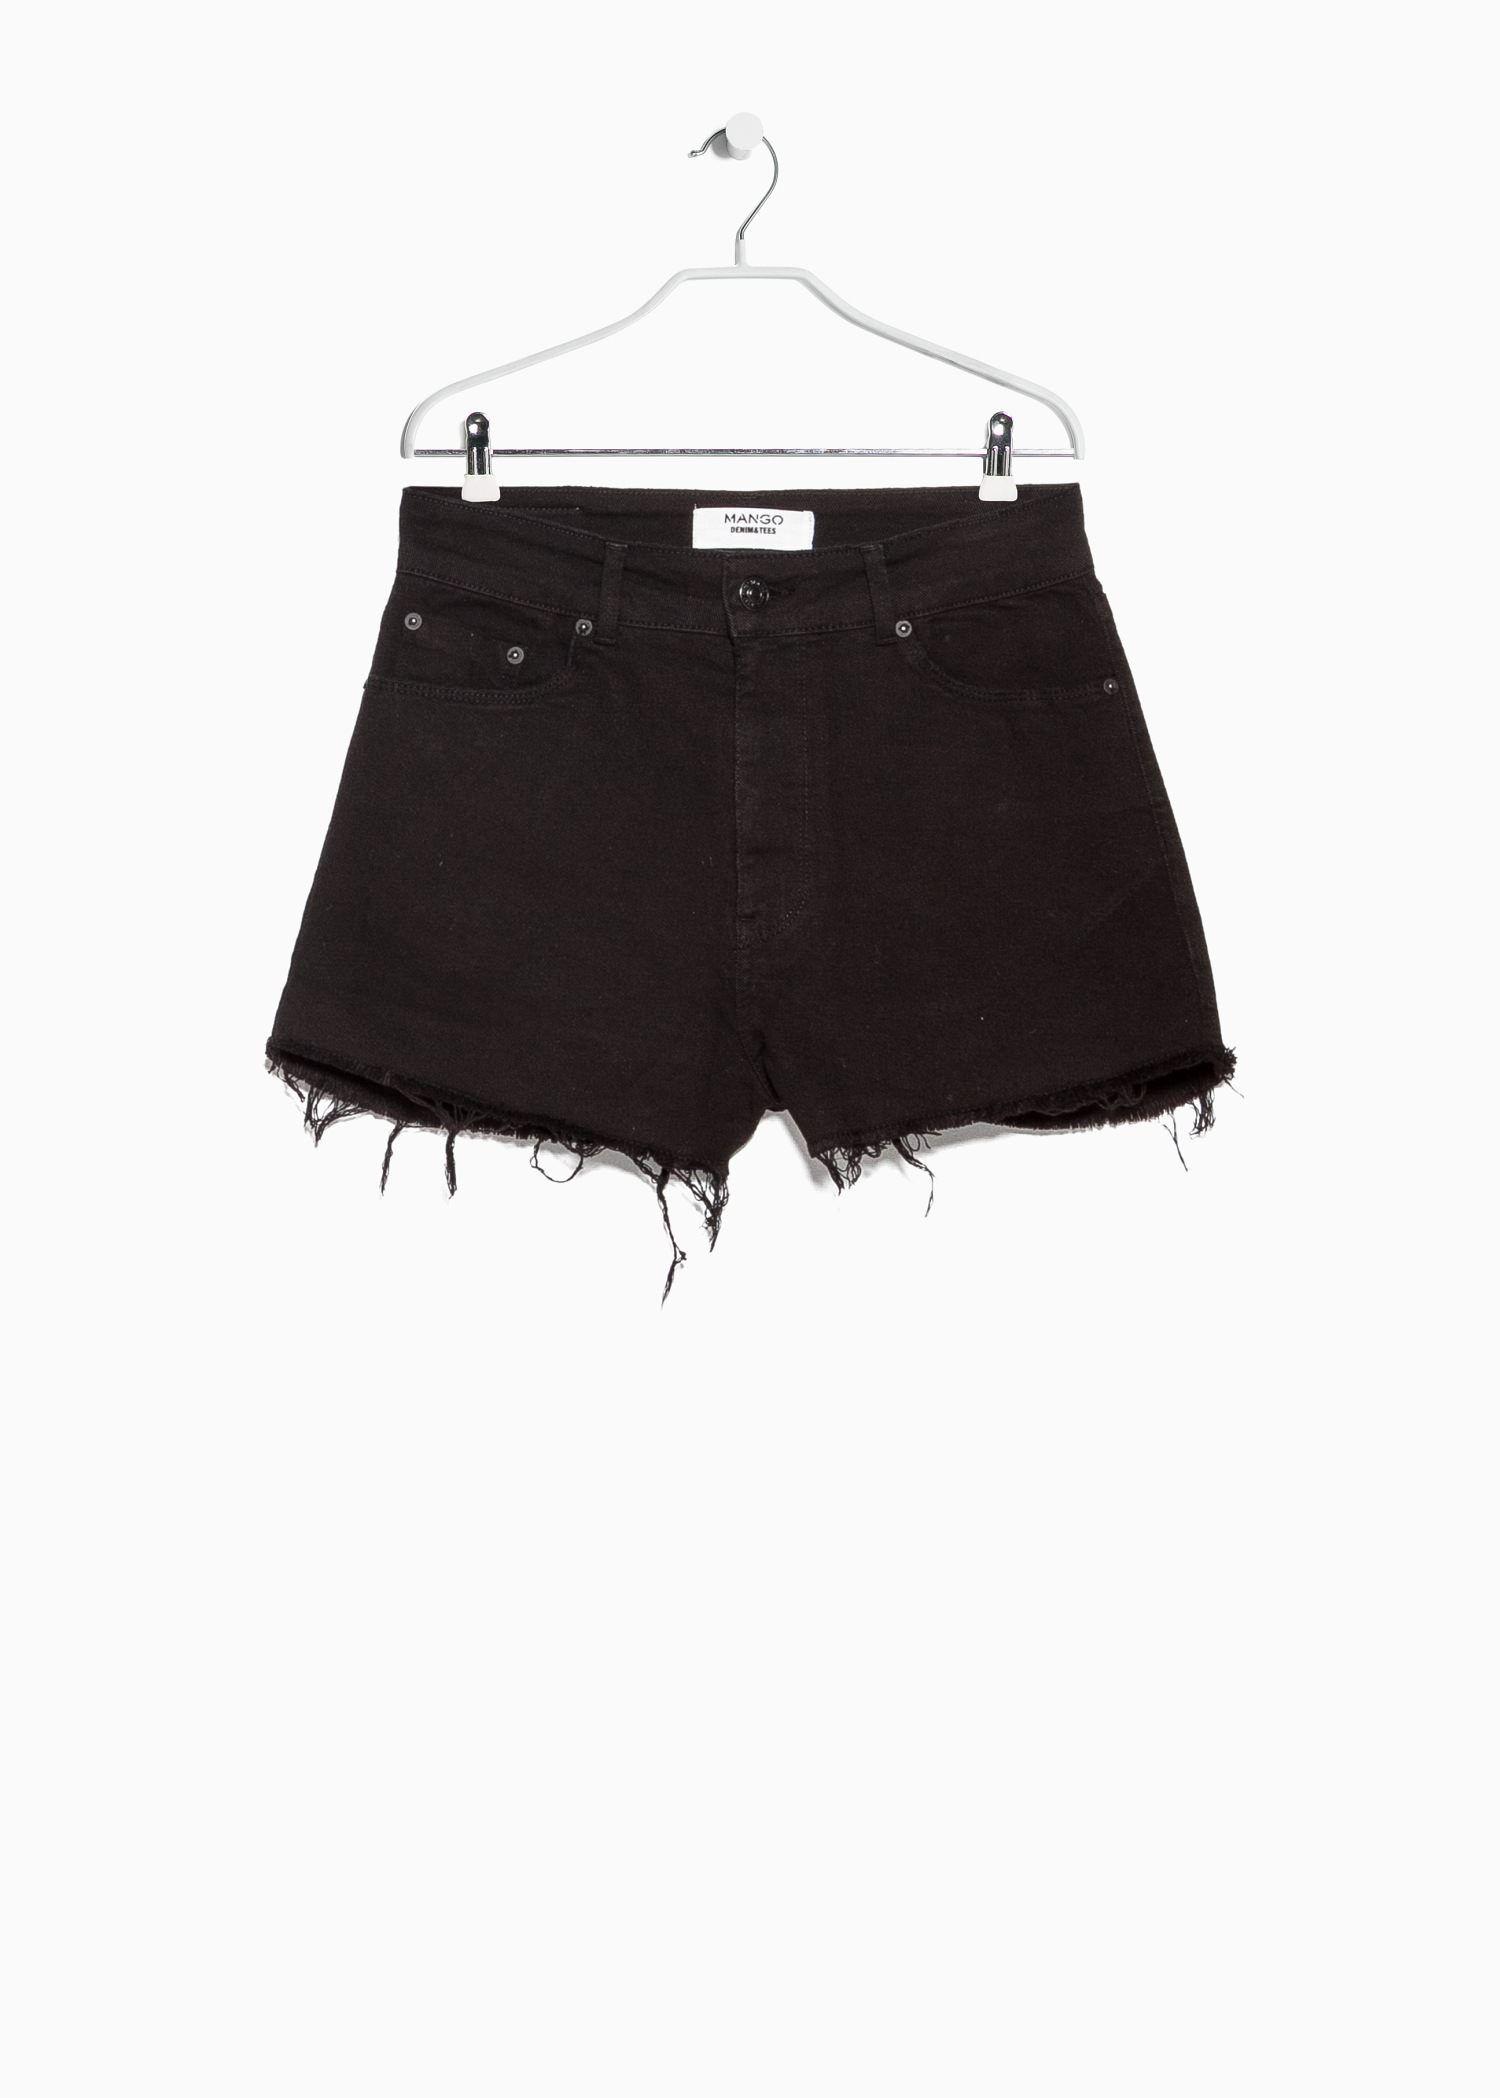 c64b6216b28e Short tiro alto - Mujer | outfits aesthethics | Shorts tiro alto ...